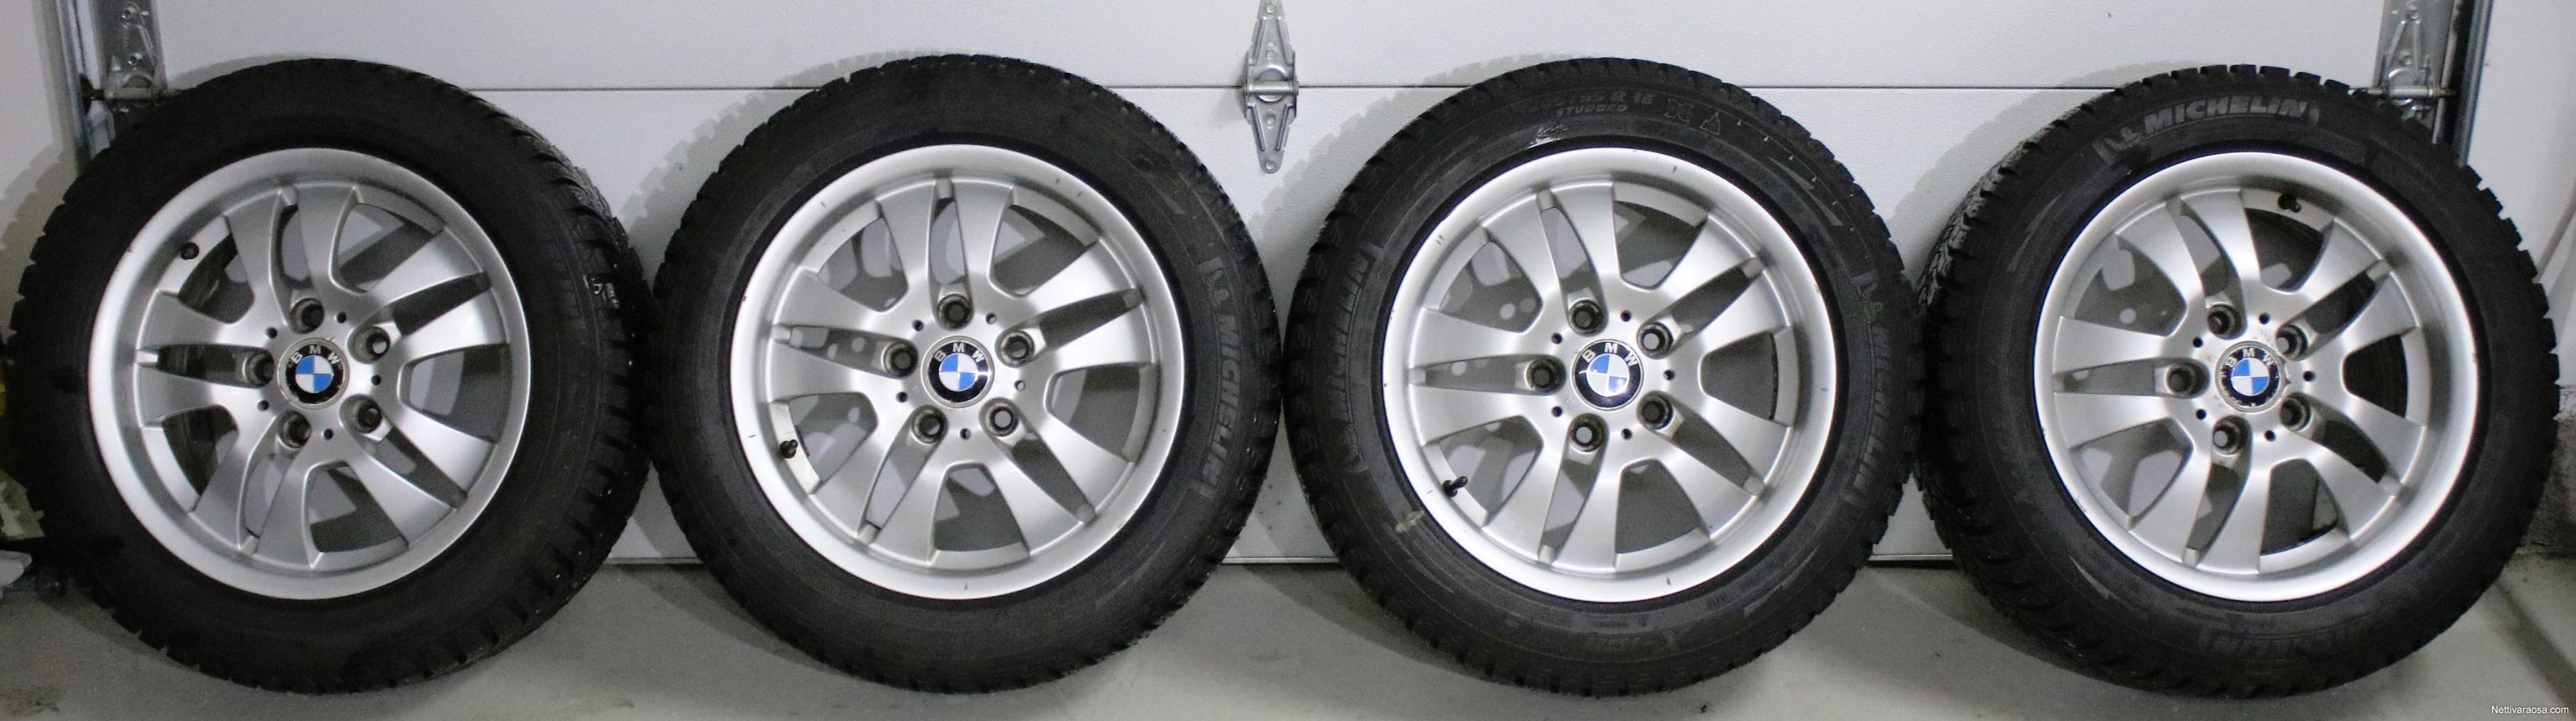 rims polished pureklas sale for faces mirror wheels bmw